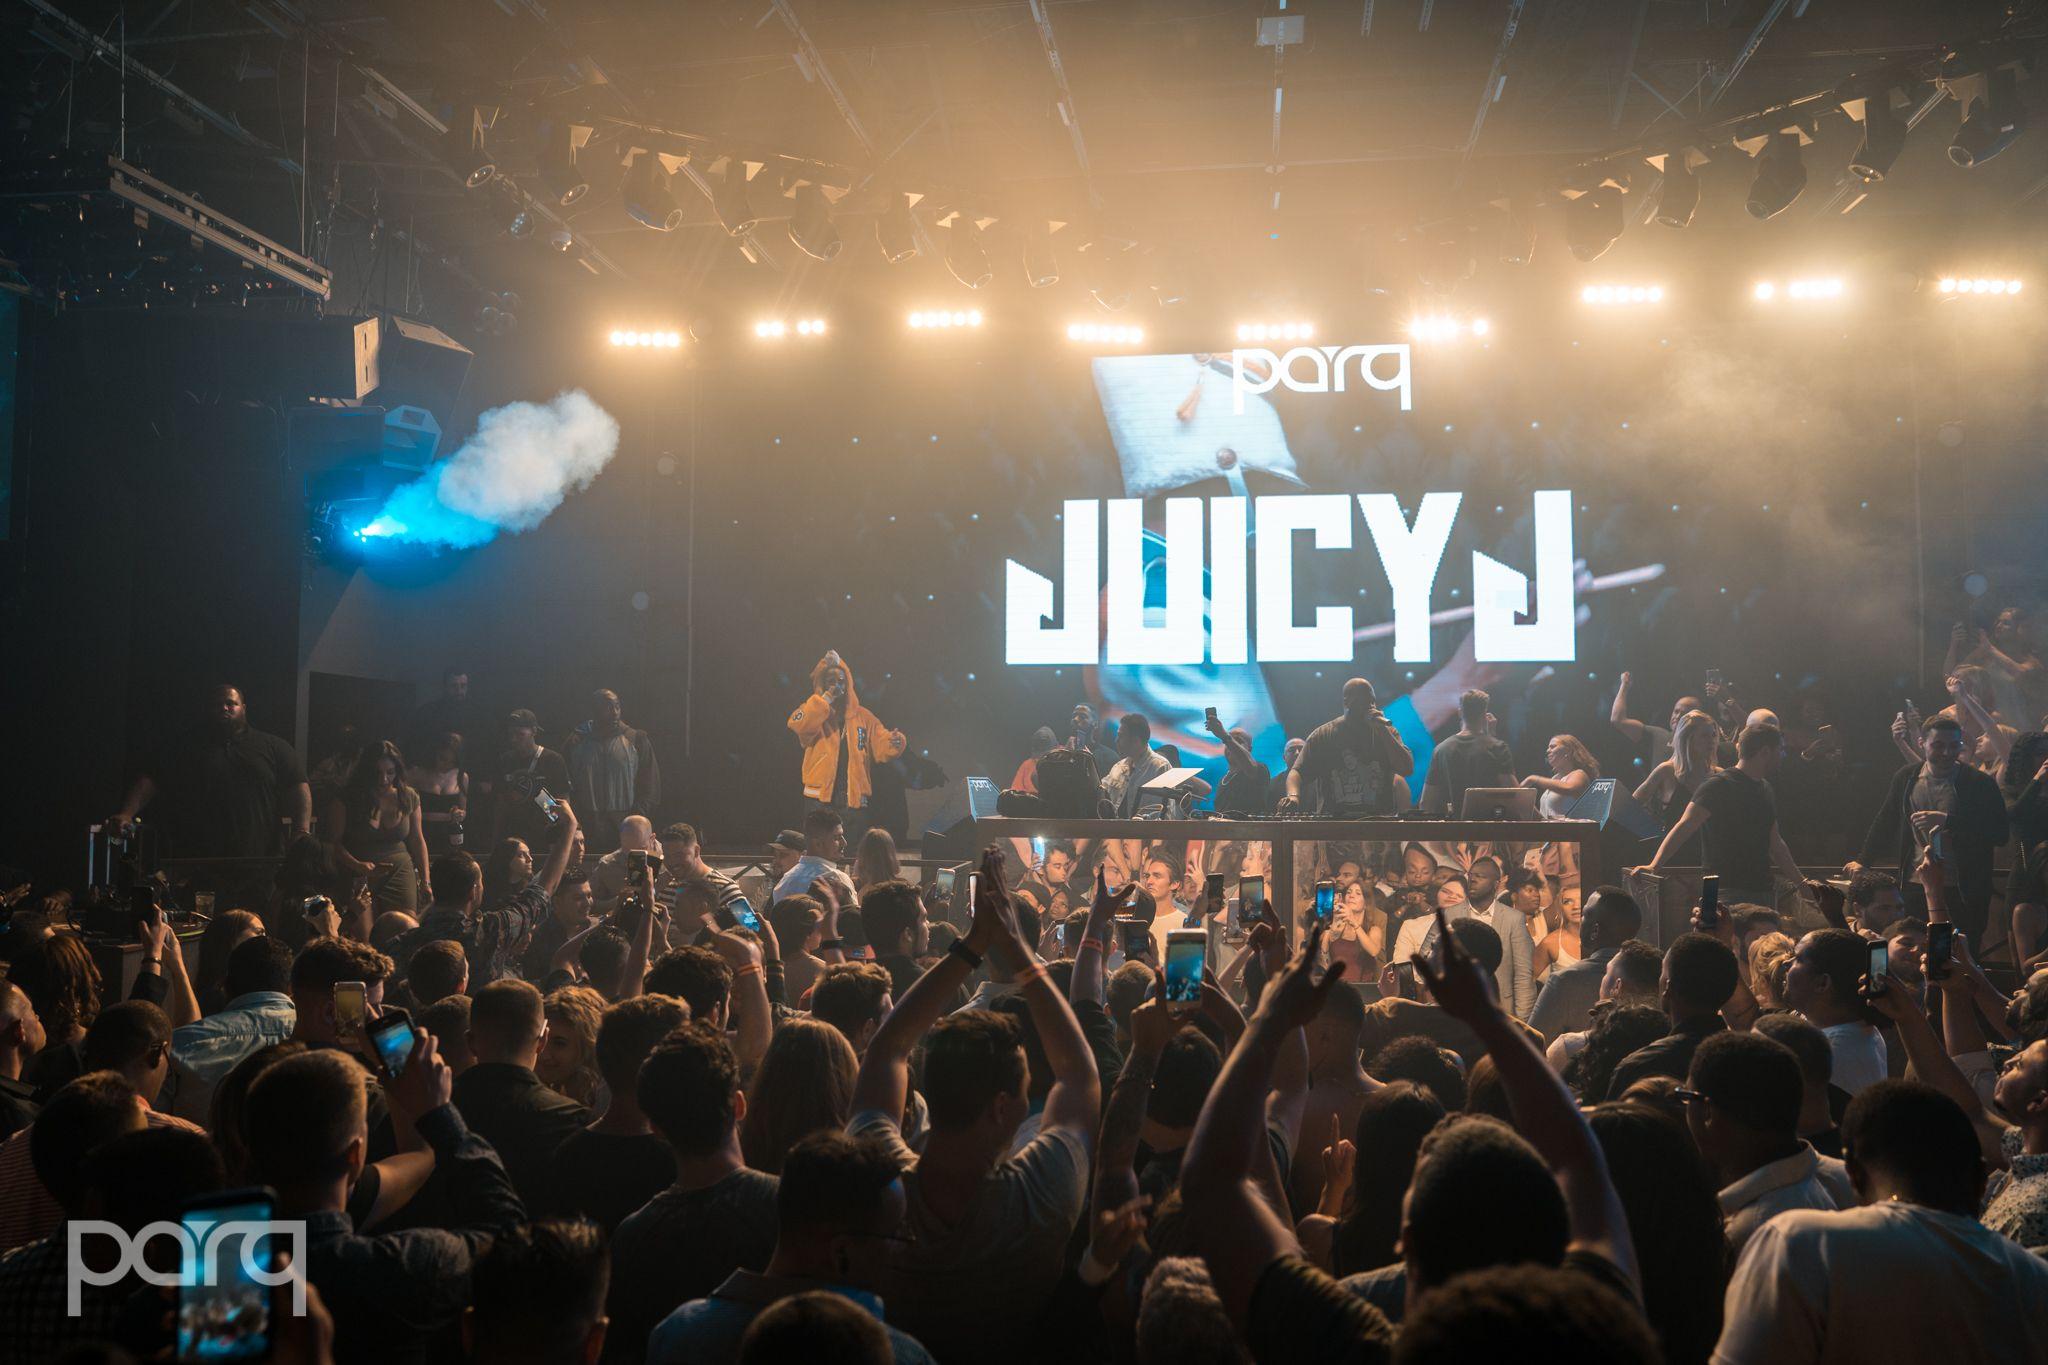 10.19.18 Parq - Juicy J-1.jpg